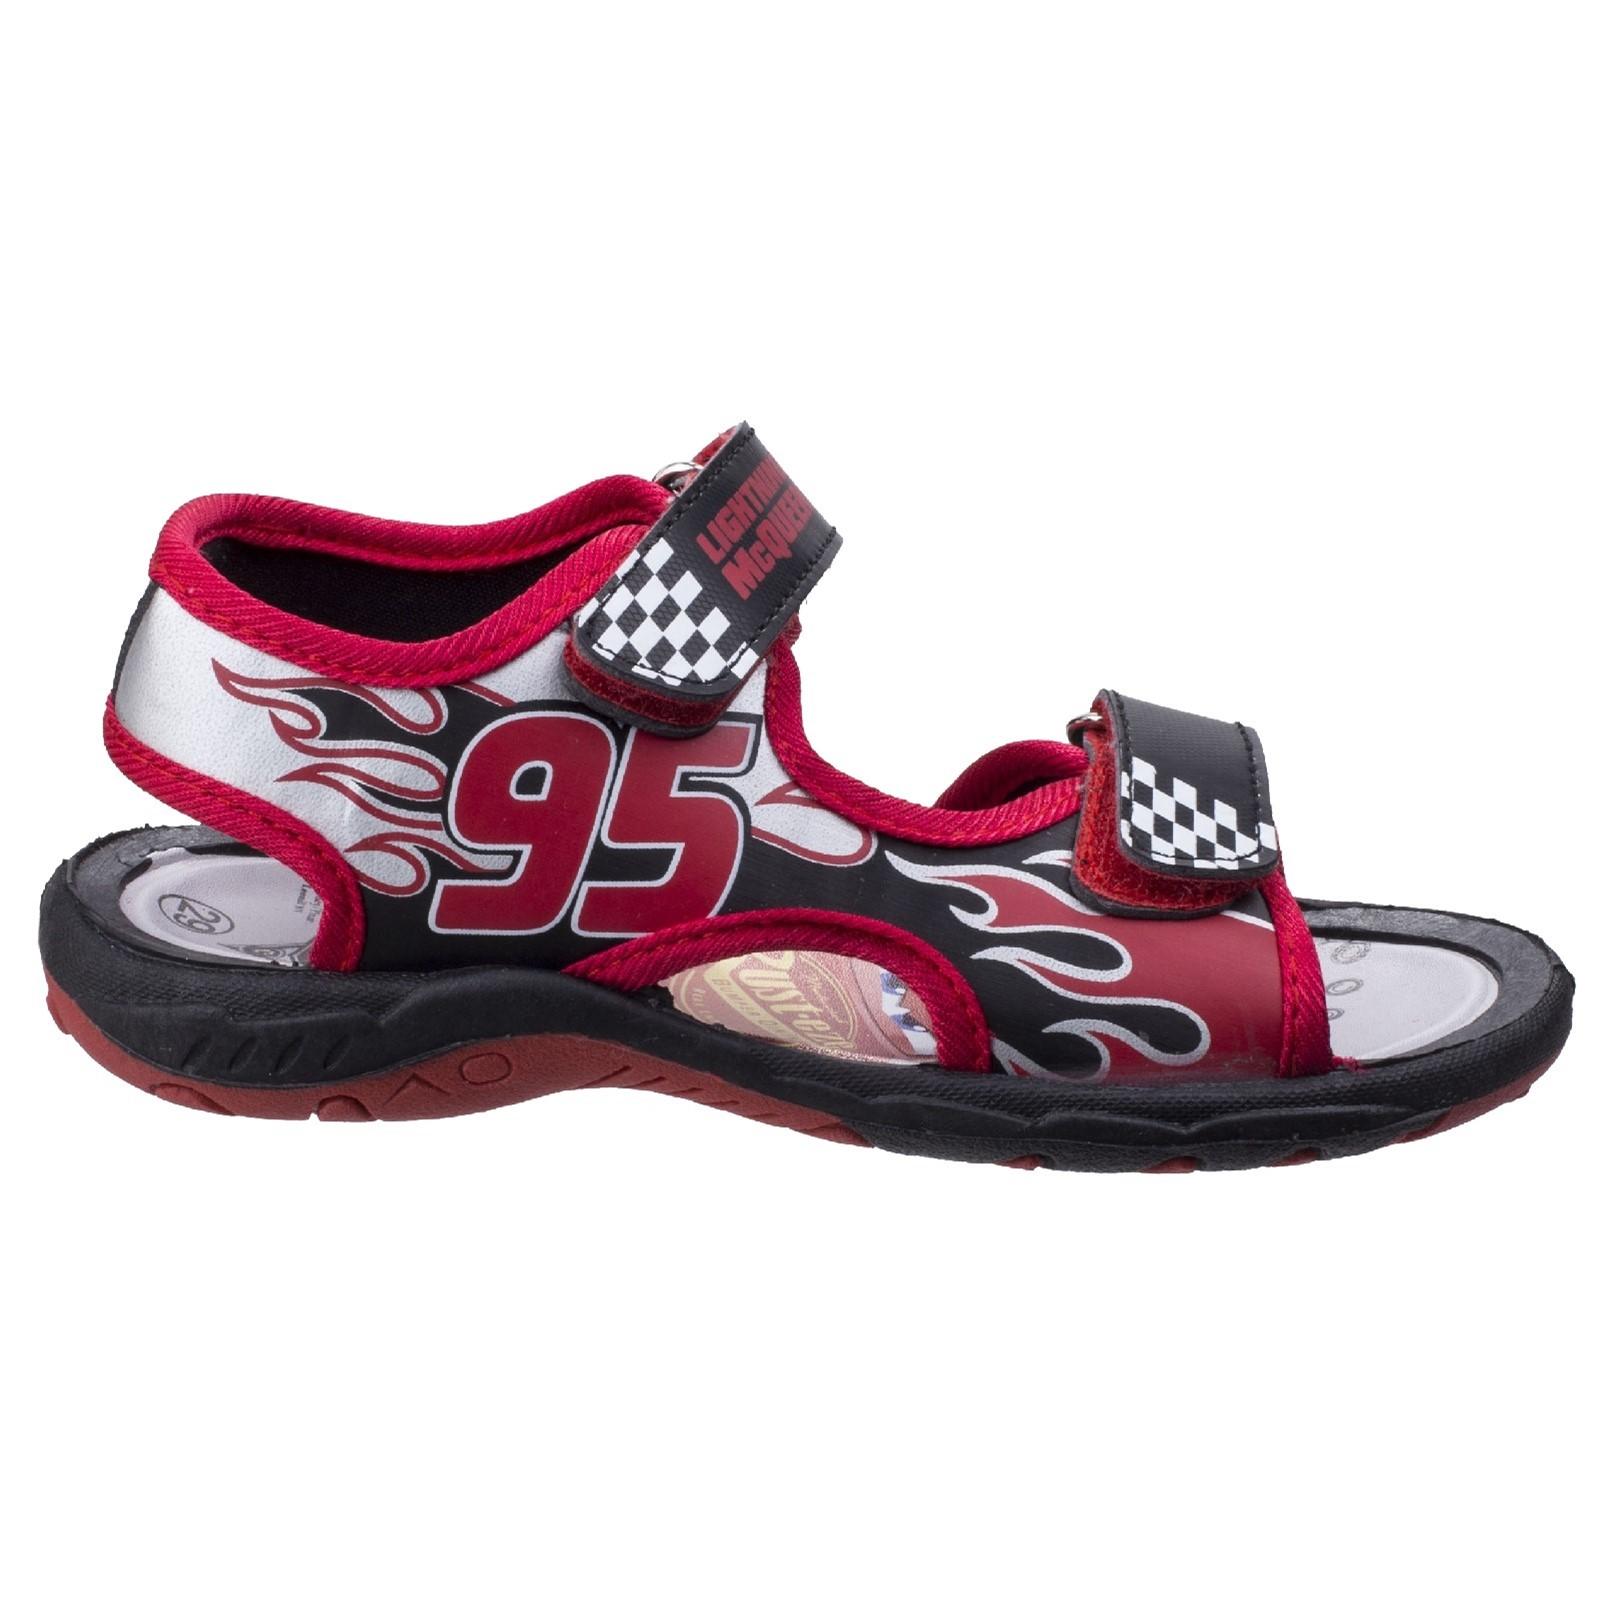 Leomil Kids Lightning McQueen Touch Fastening Sandal